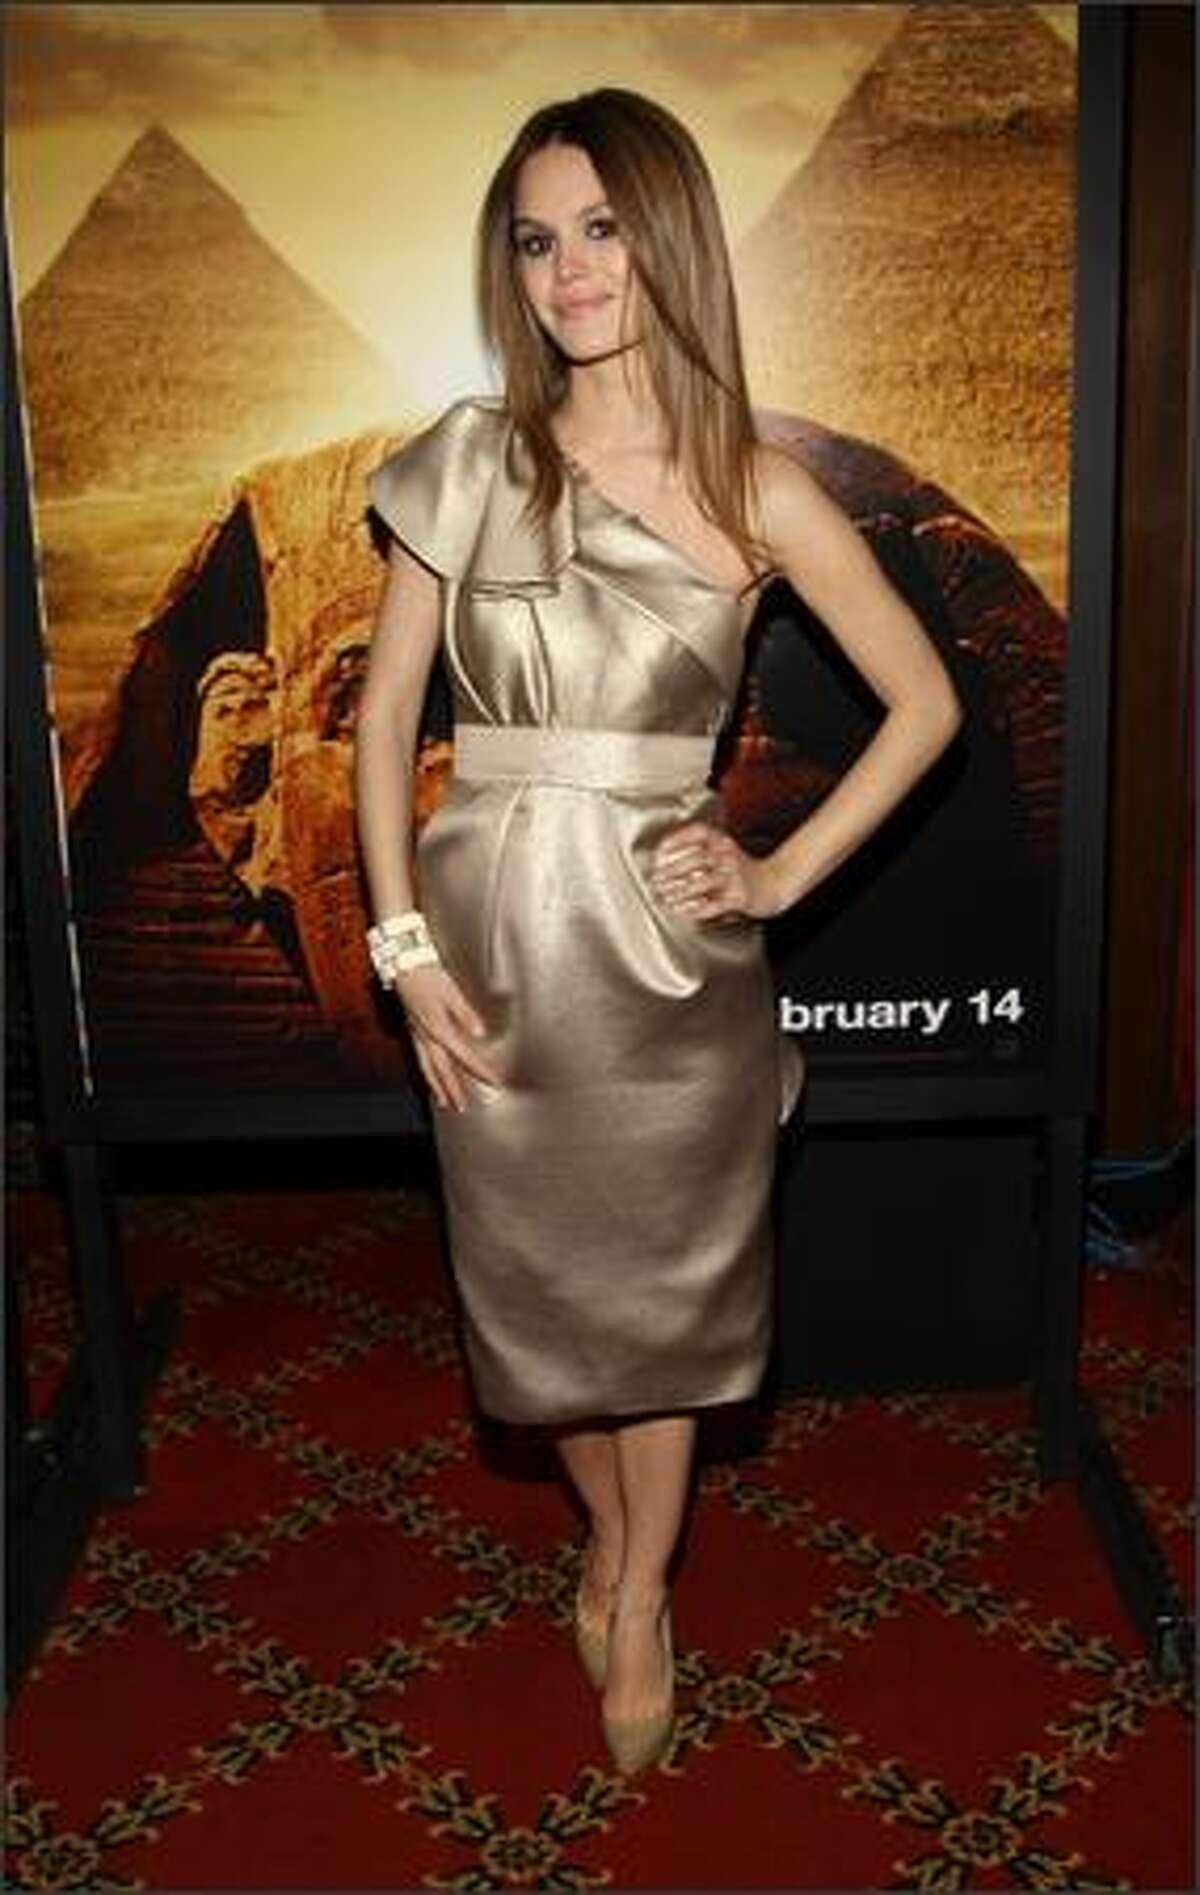 Actress Rachel Bilson attends the premiere of